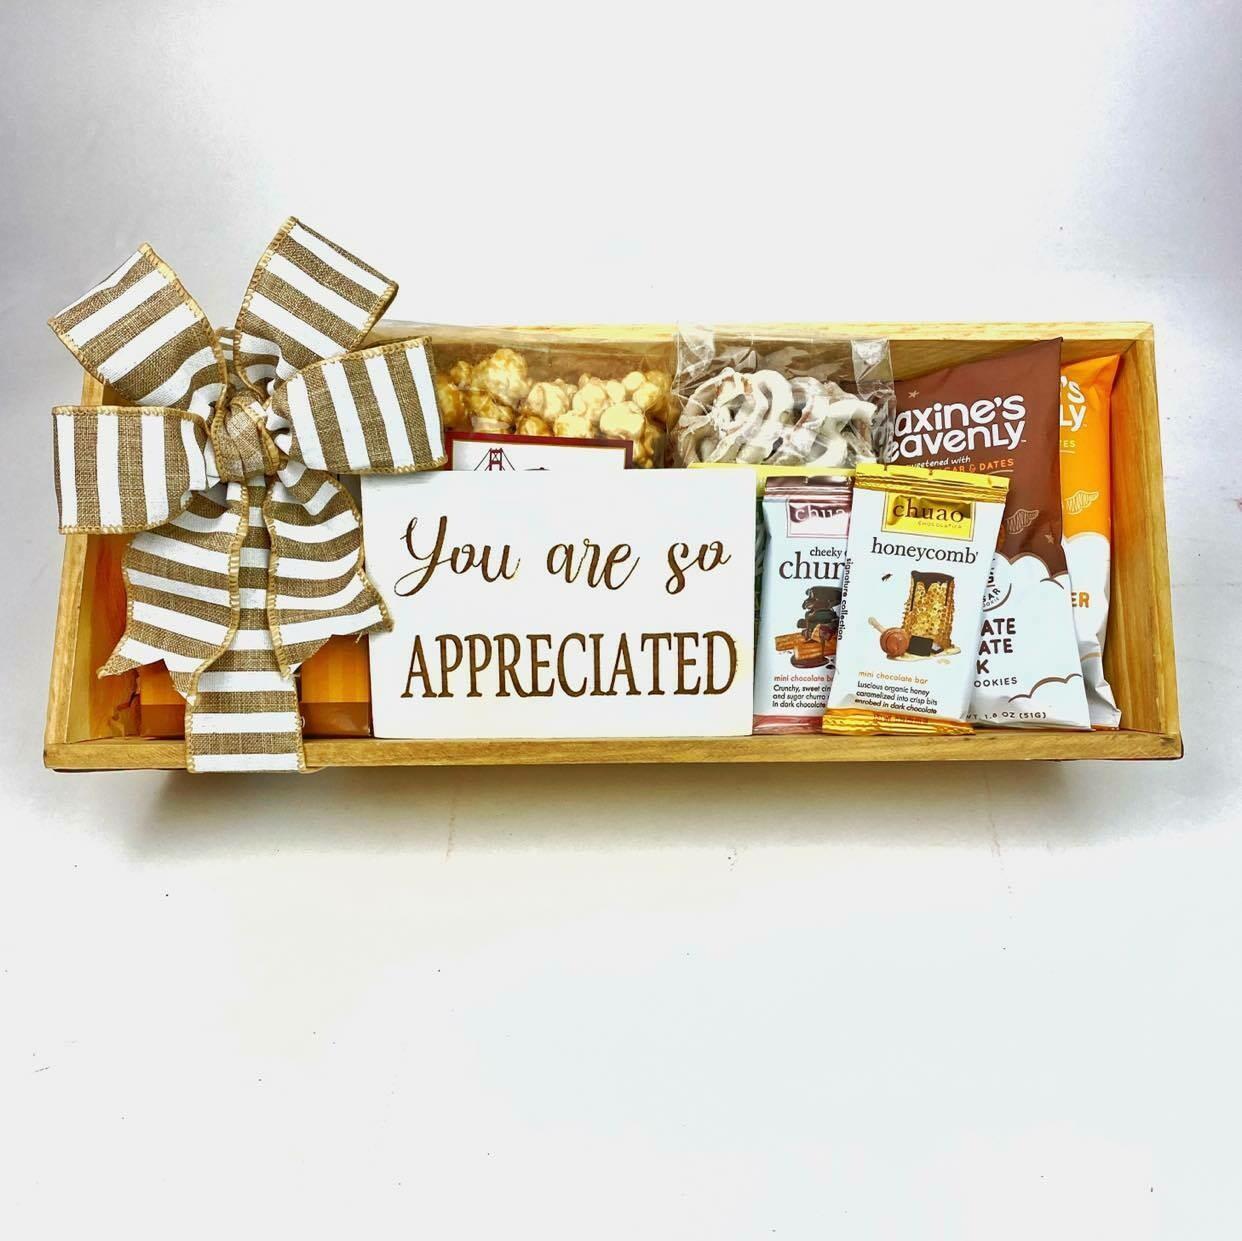 Appreciated!